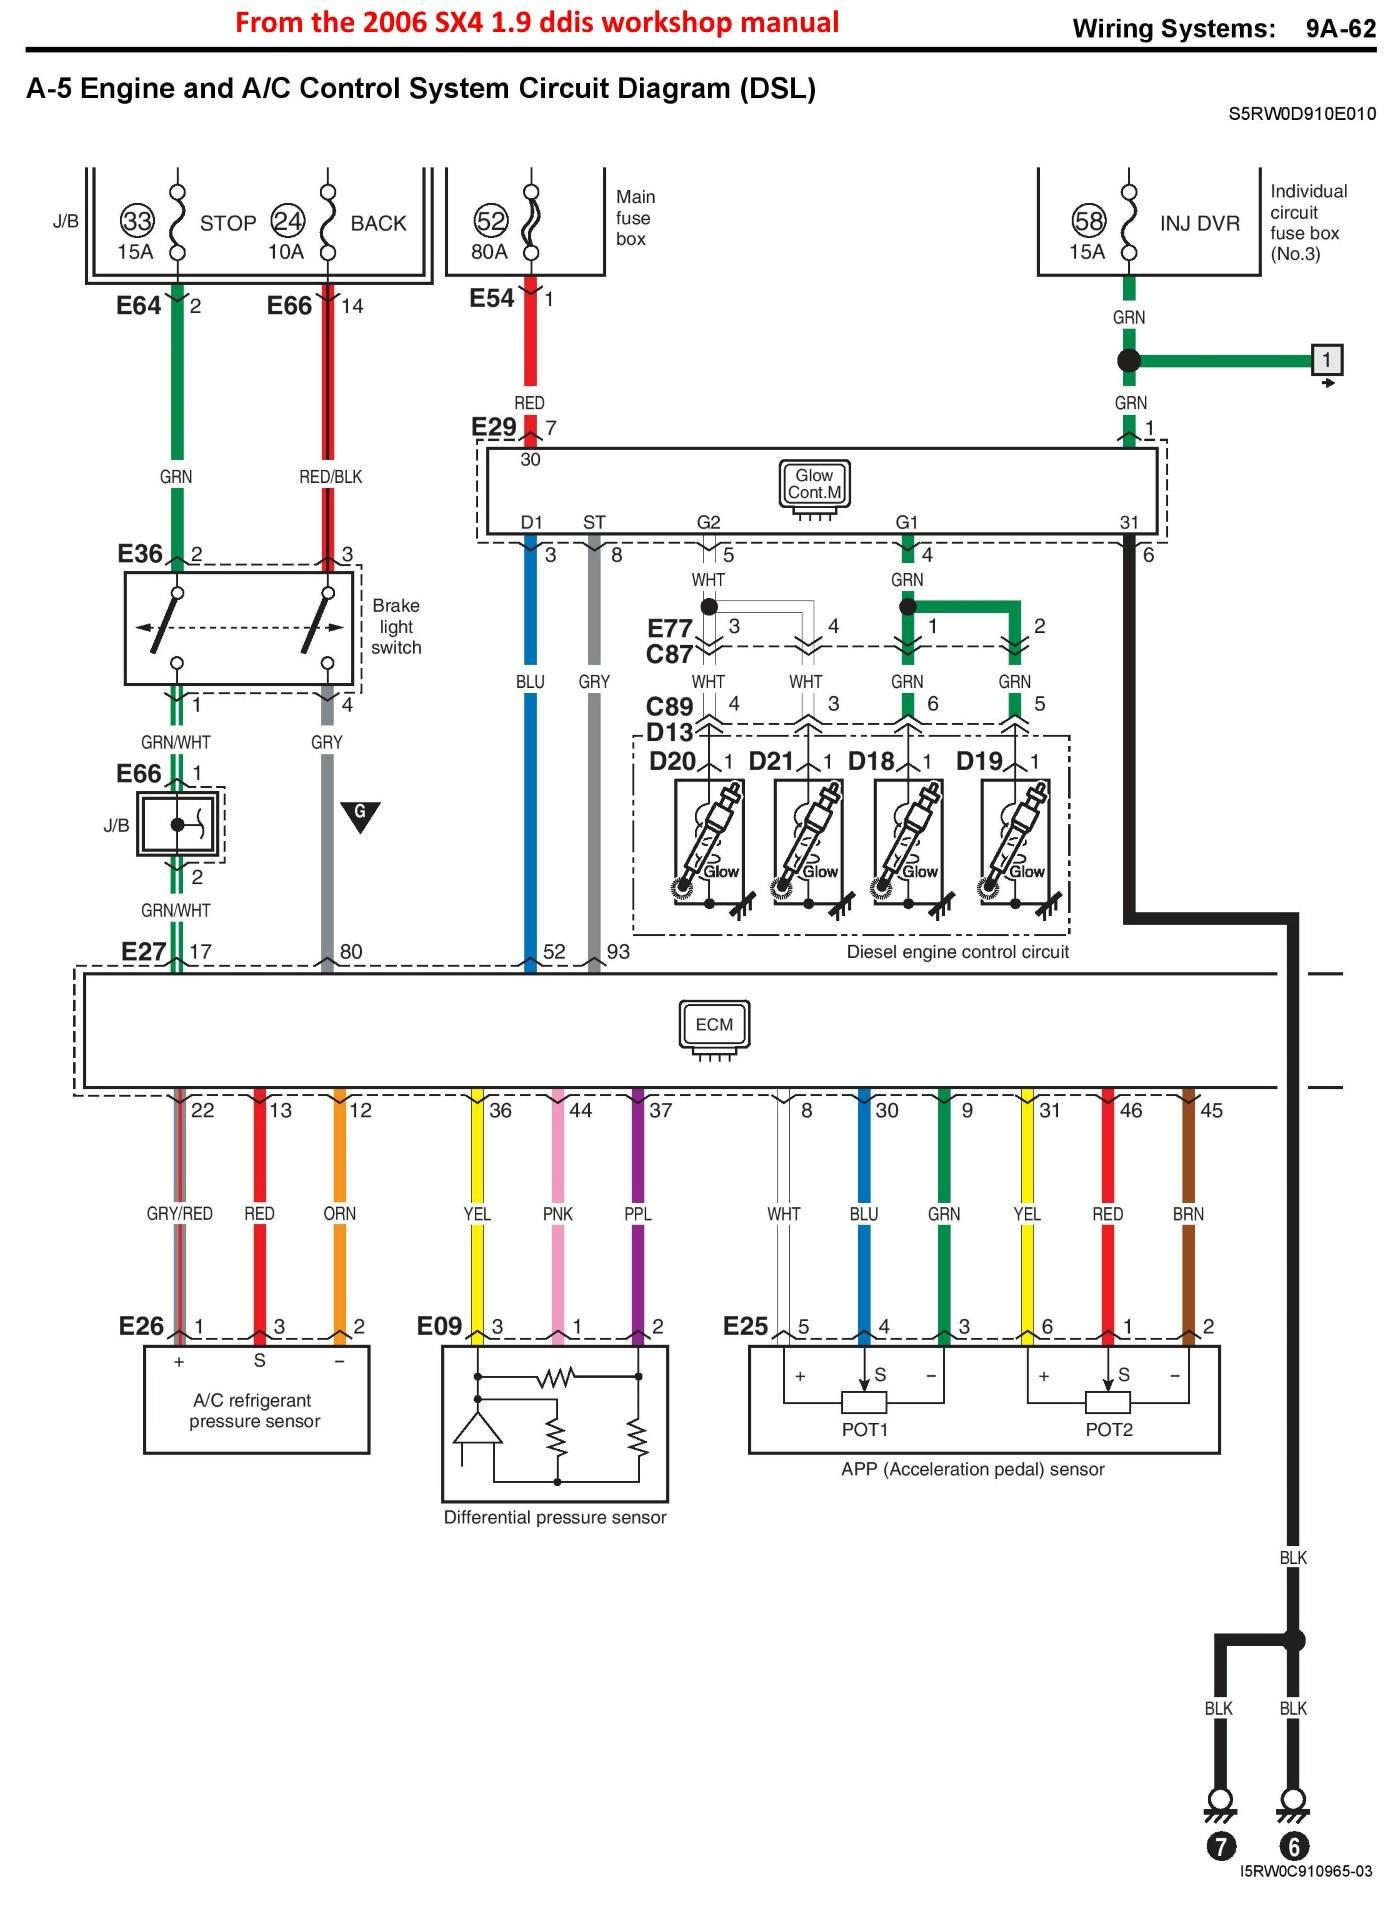 glow plug timer relay wiring diagram